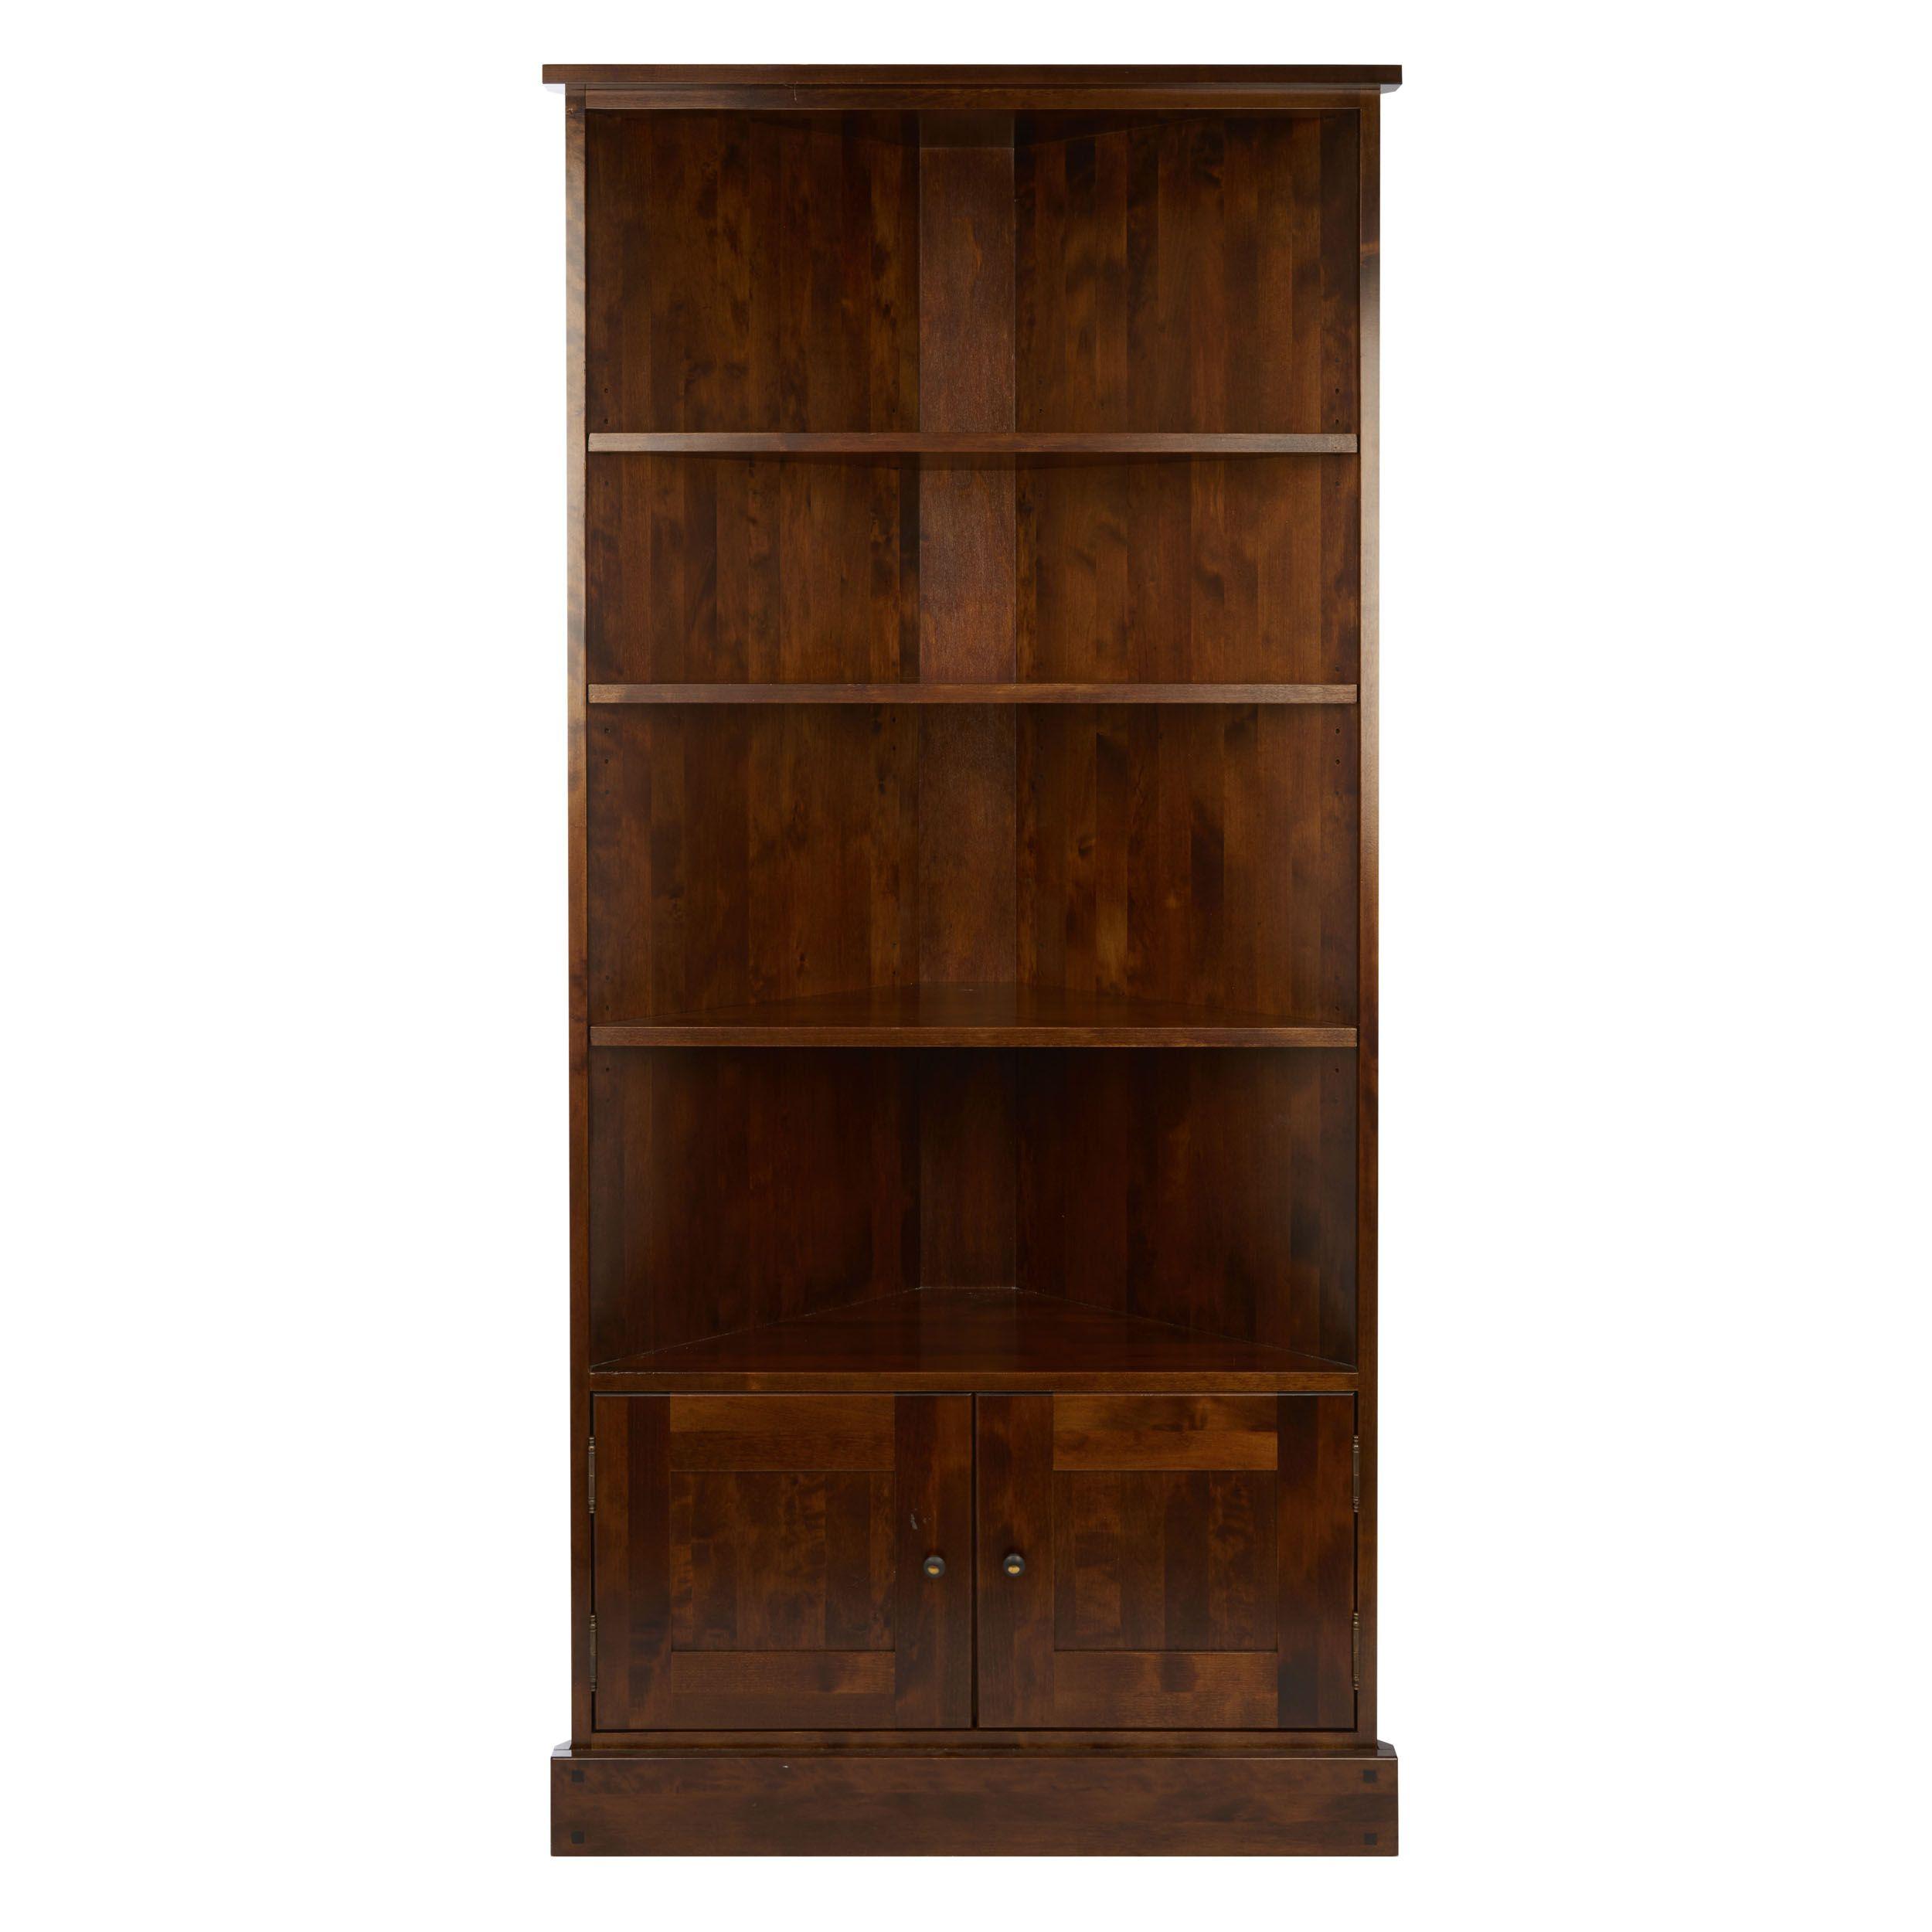 Storage Cabinets Wood Storage Cabinets With Doors Storage